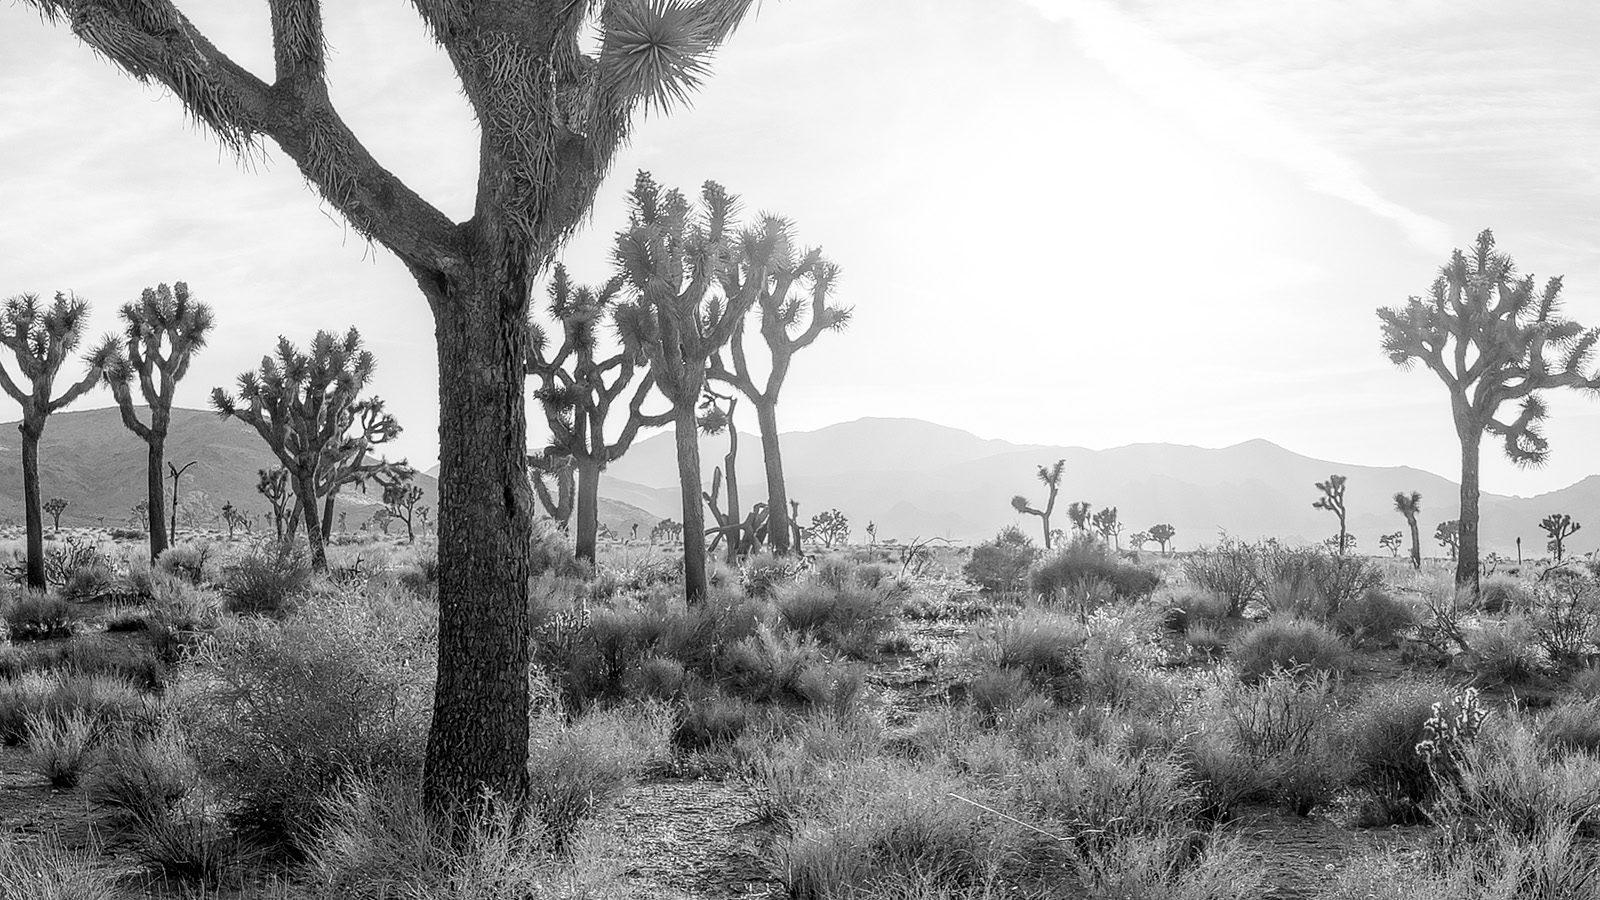 Joshua Tree California - Black and White Fine Art Landscape Photography.